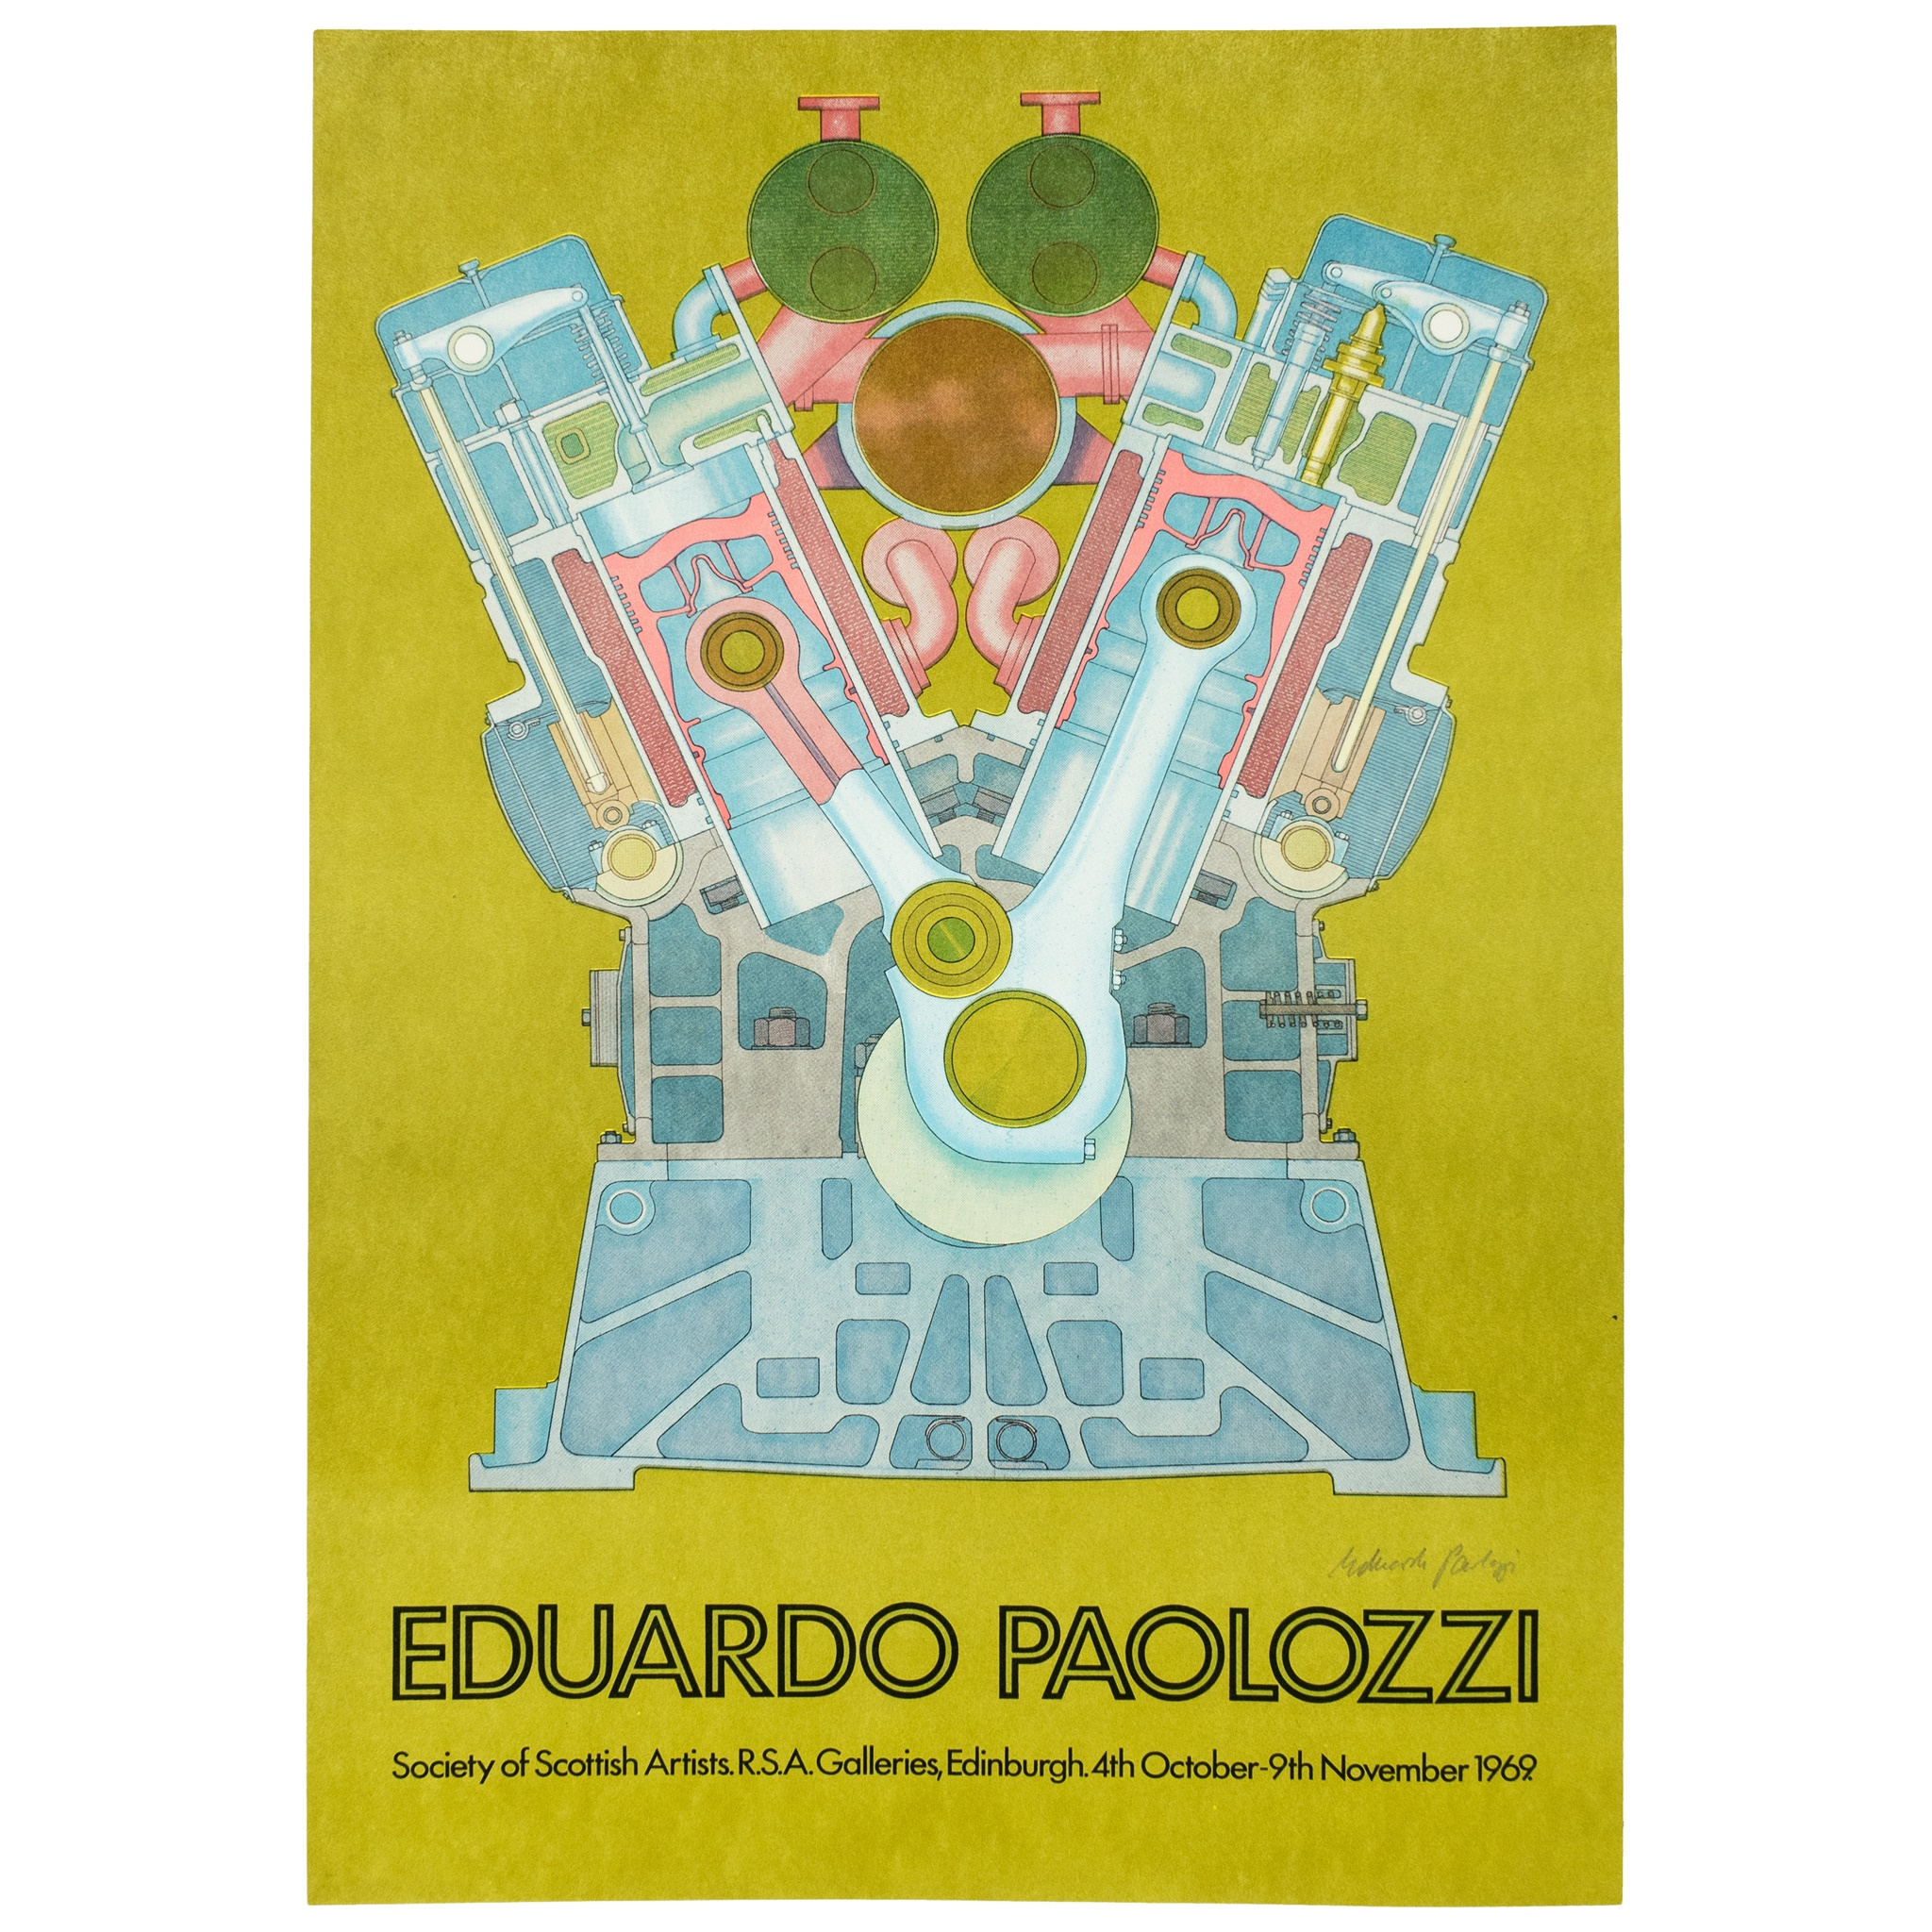 AFTER EDUARDO PAOLOZZI (SCOTTISH 1924-2005) SOCIETY OF SCOTTISH ARTISTS